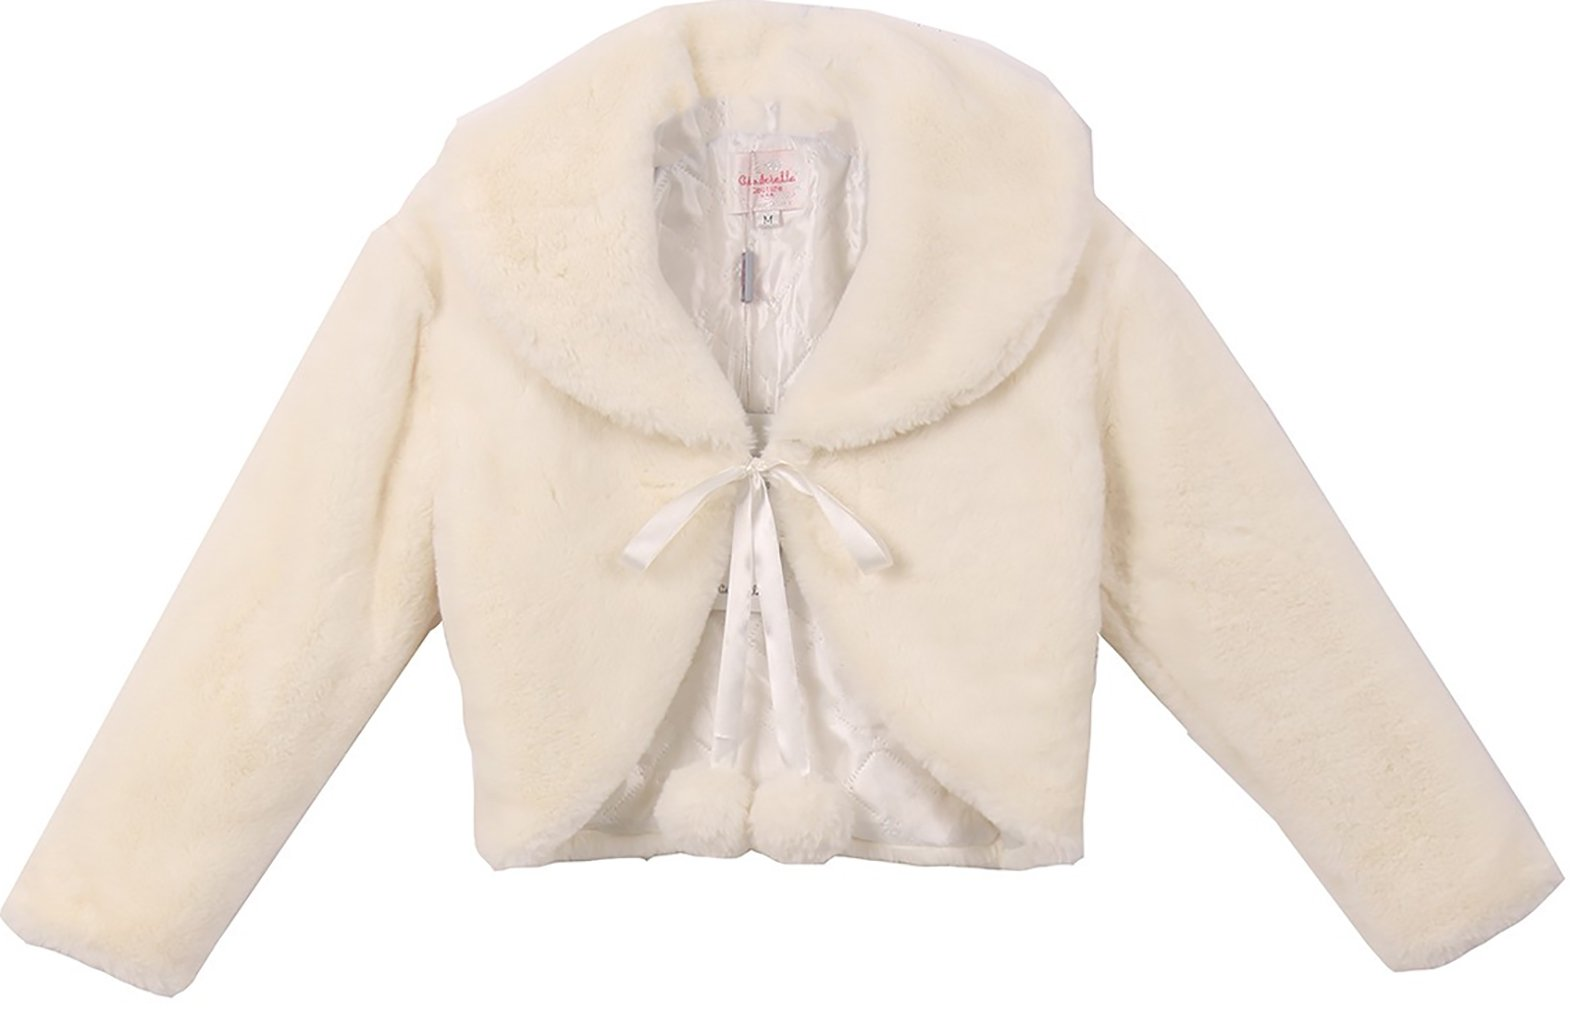 Little Girls Super Soft Peter Pan Collar Fur Coat Flower Girls Knit Cotton Bolero (30C11C) Ivory M